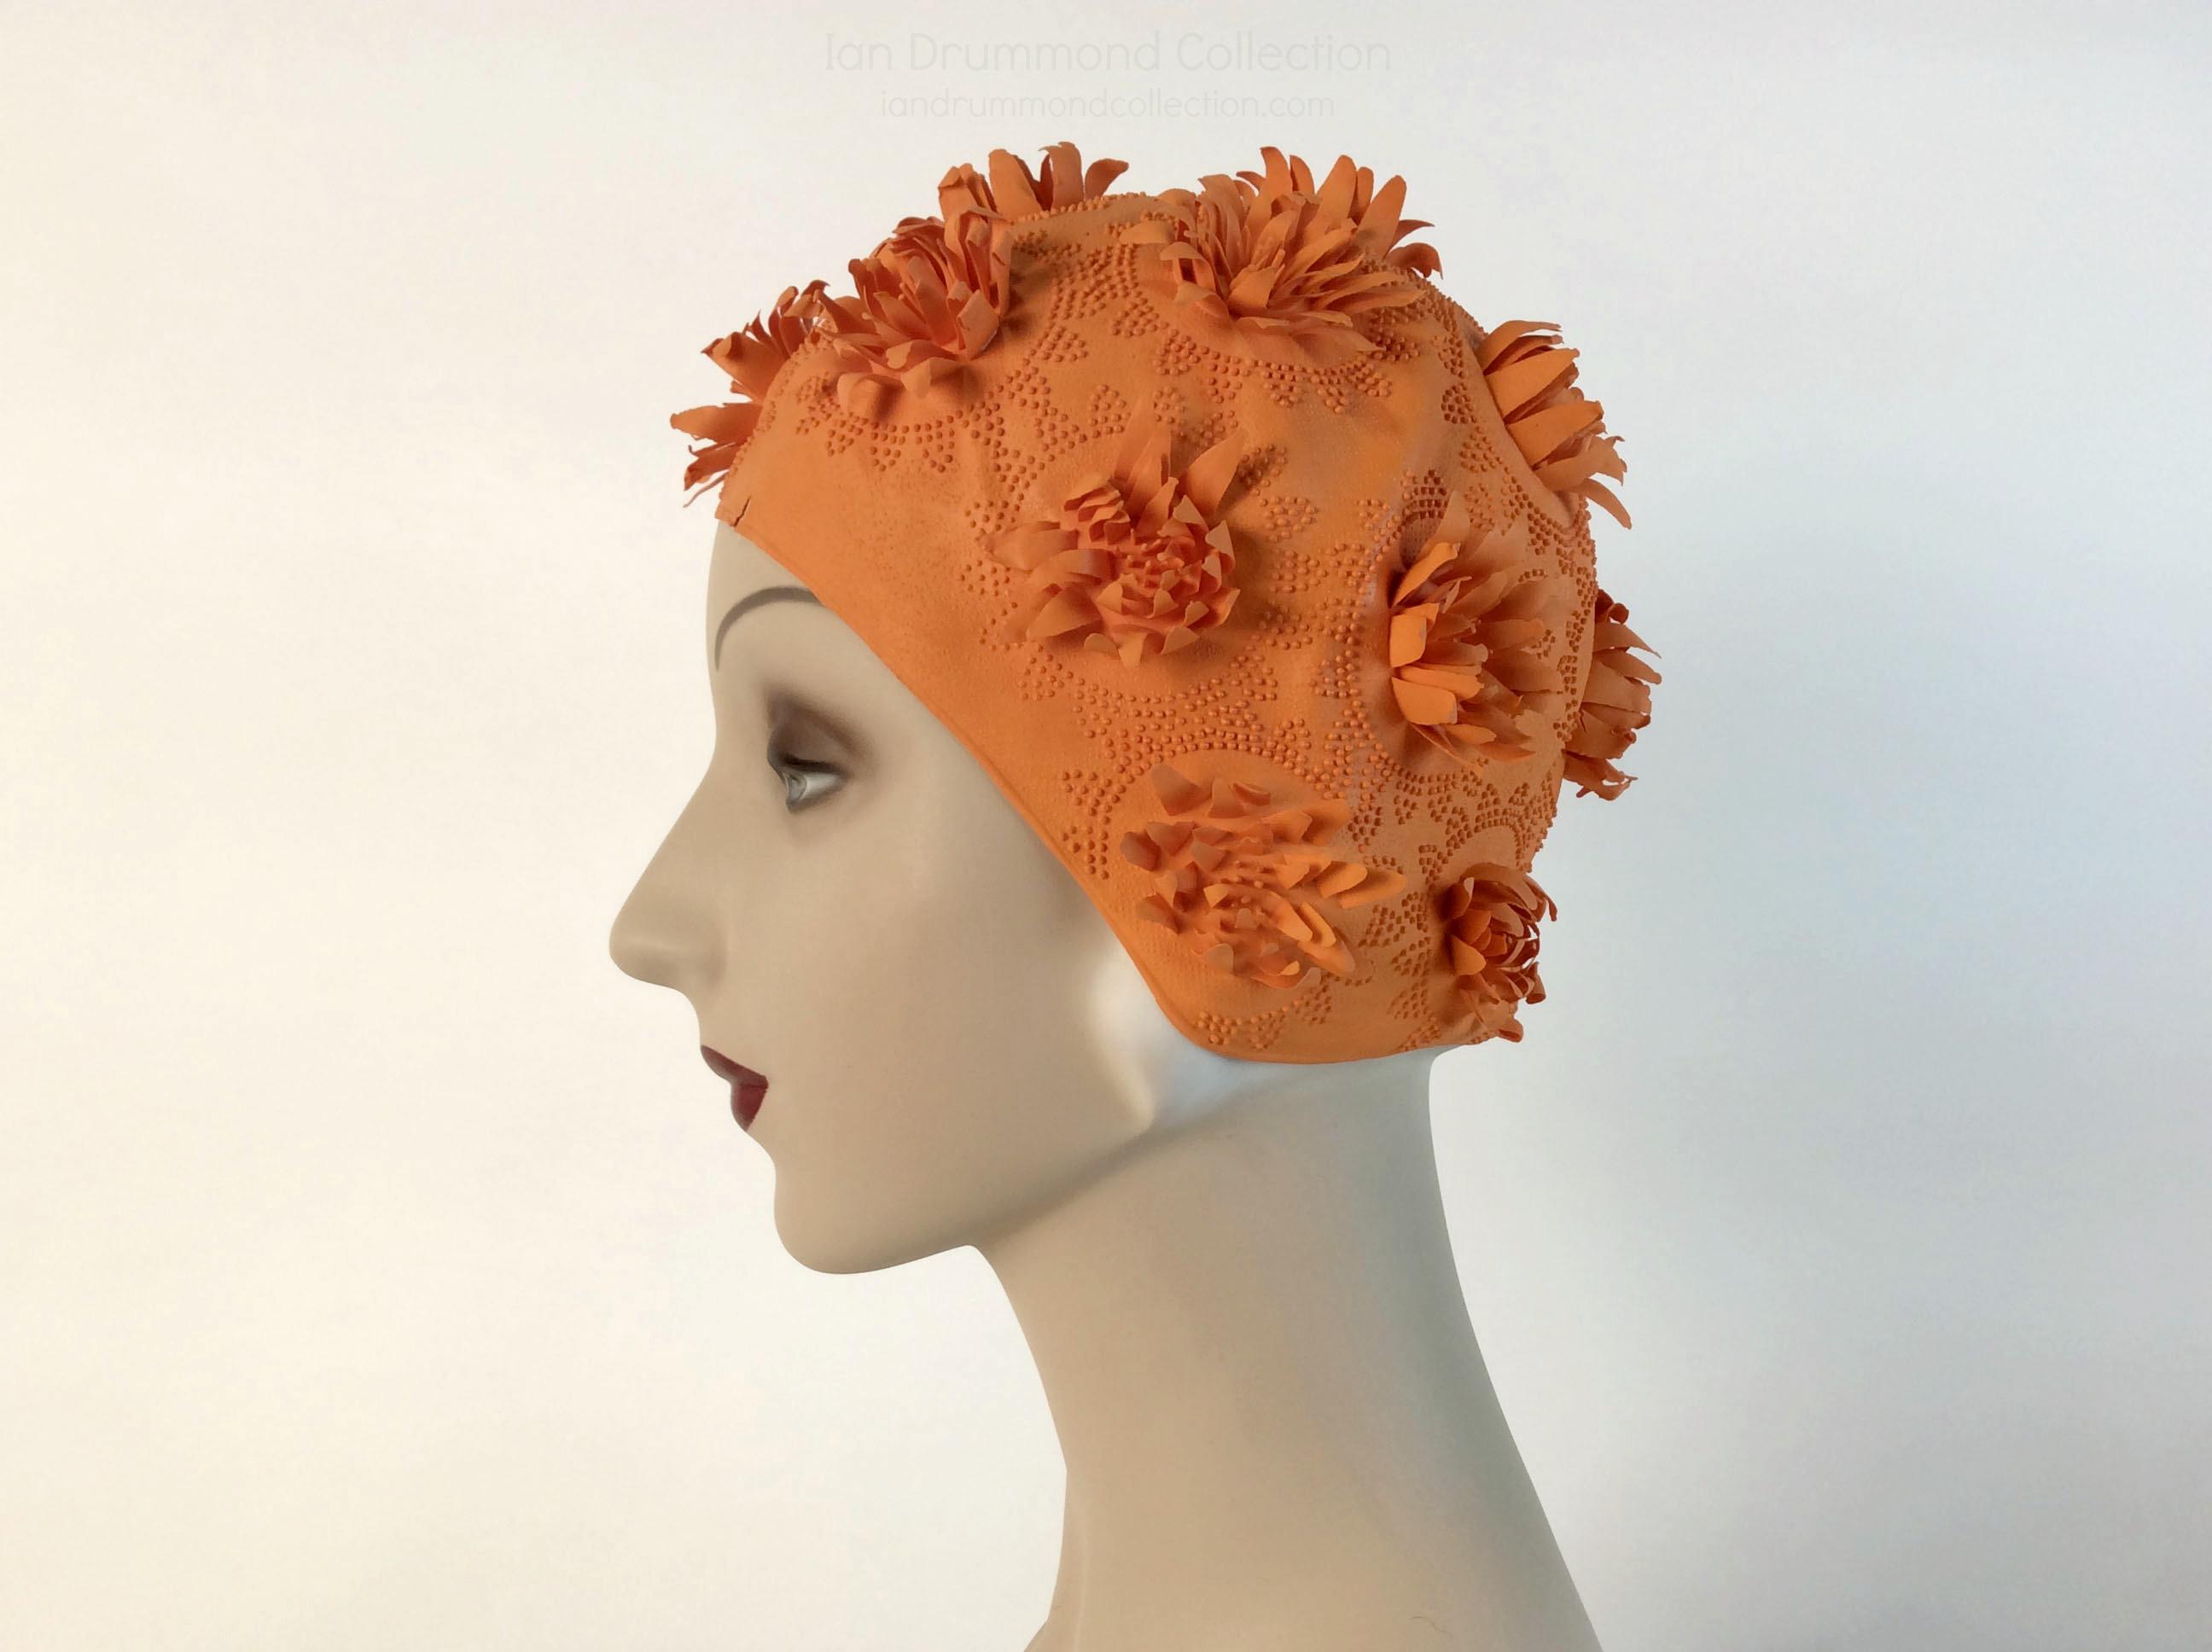 IDC Movie Wardrobe Rental Swim Cap 20 Bright Orane with Raised Petal and Dot Flower Designs